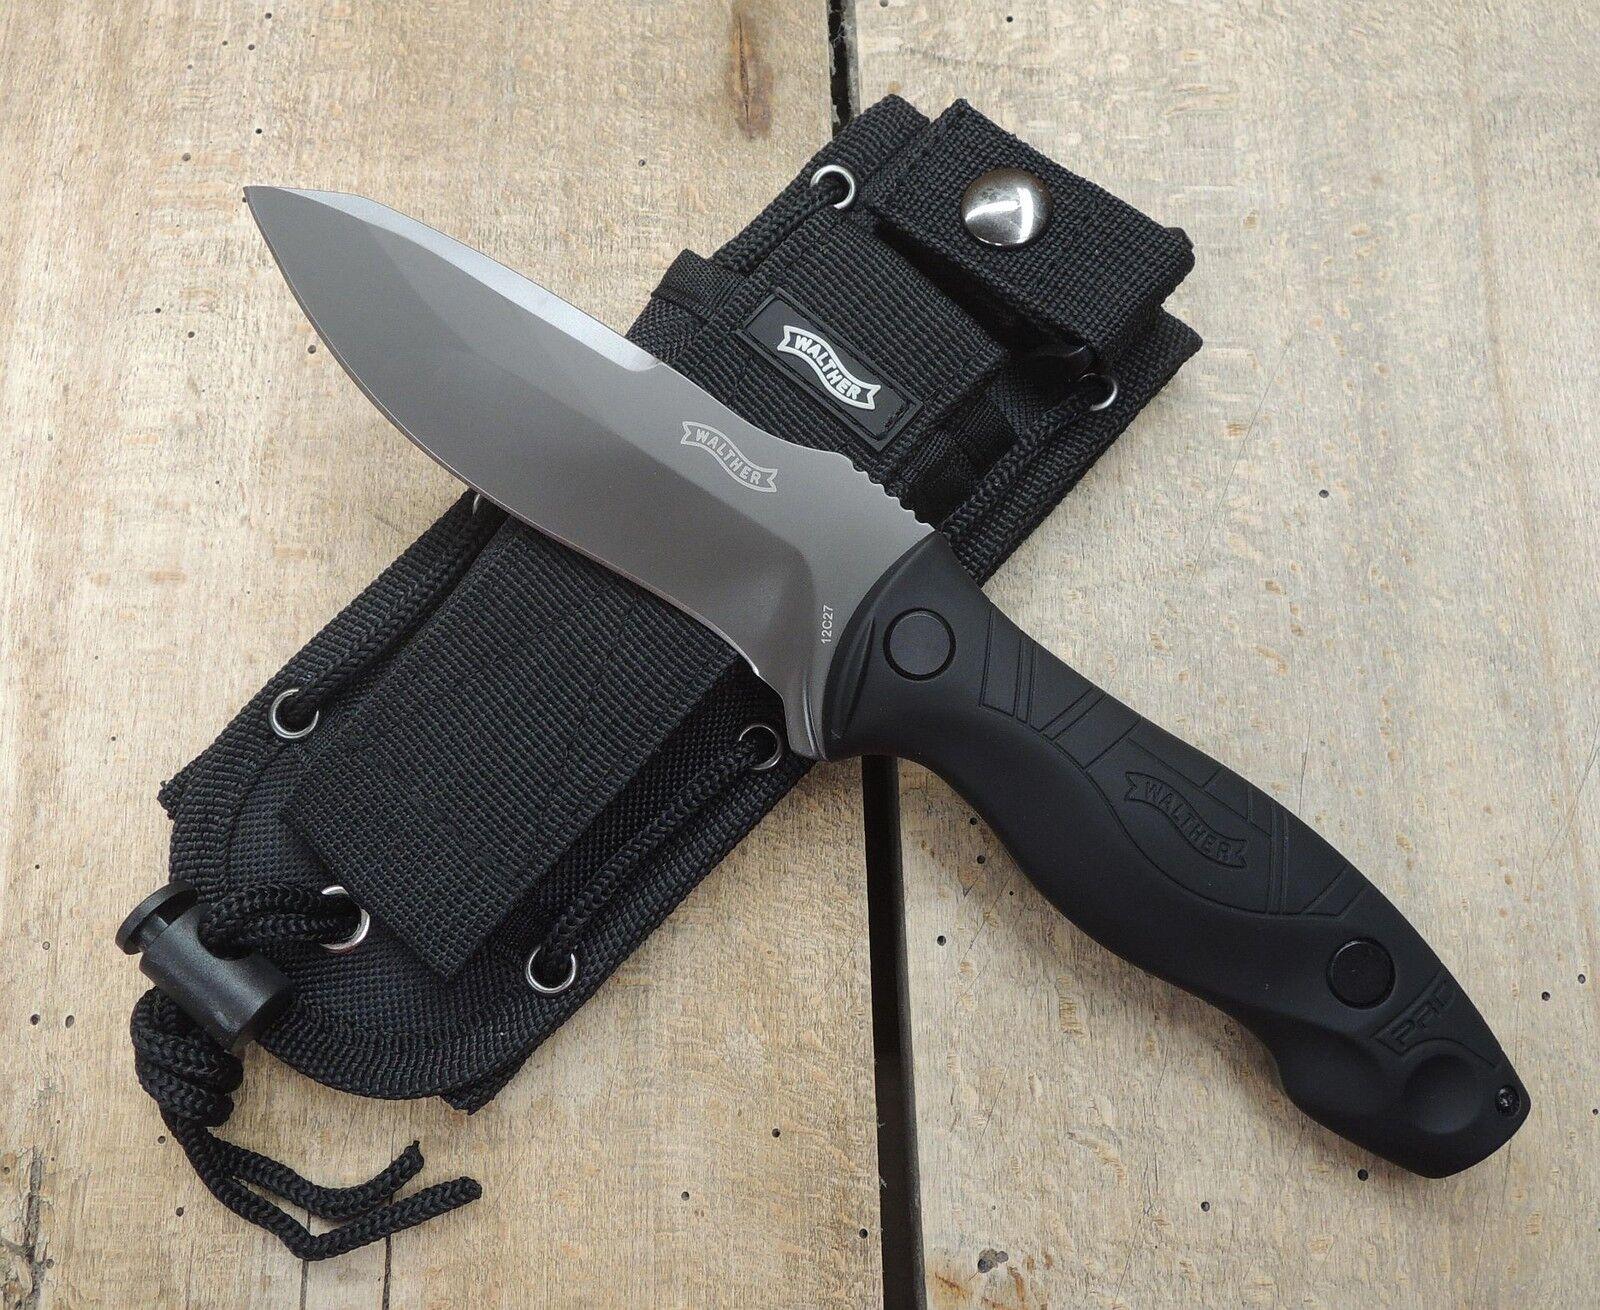 Walther Pro FBK FBK FBK Messer Fixed Blade Knife 12C27 Sandvik Stahl G10 Griff + Scheide 51c14b